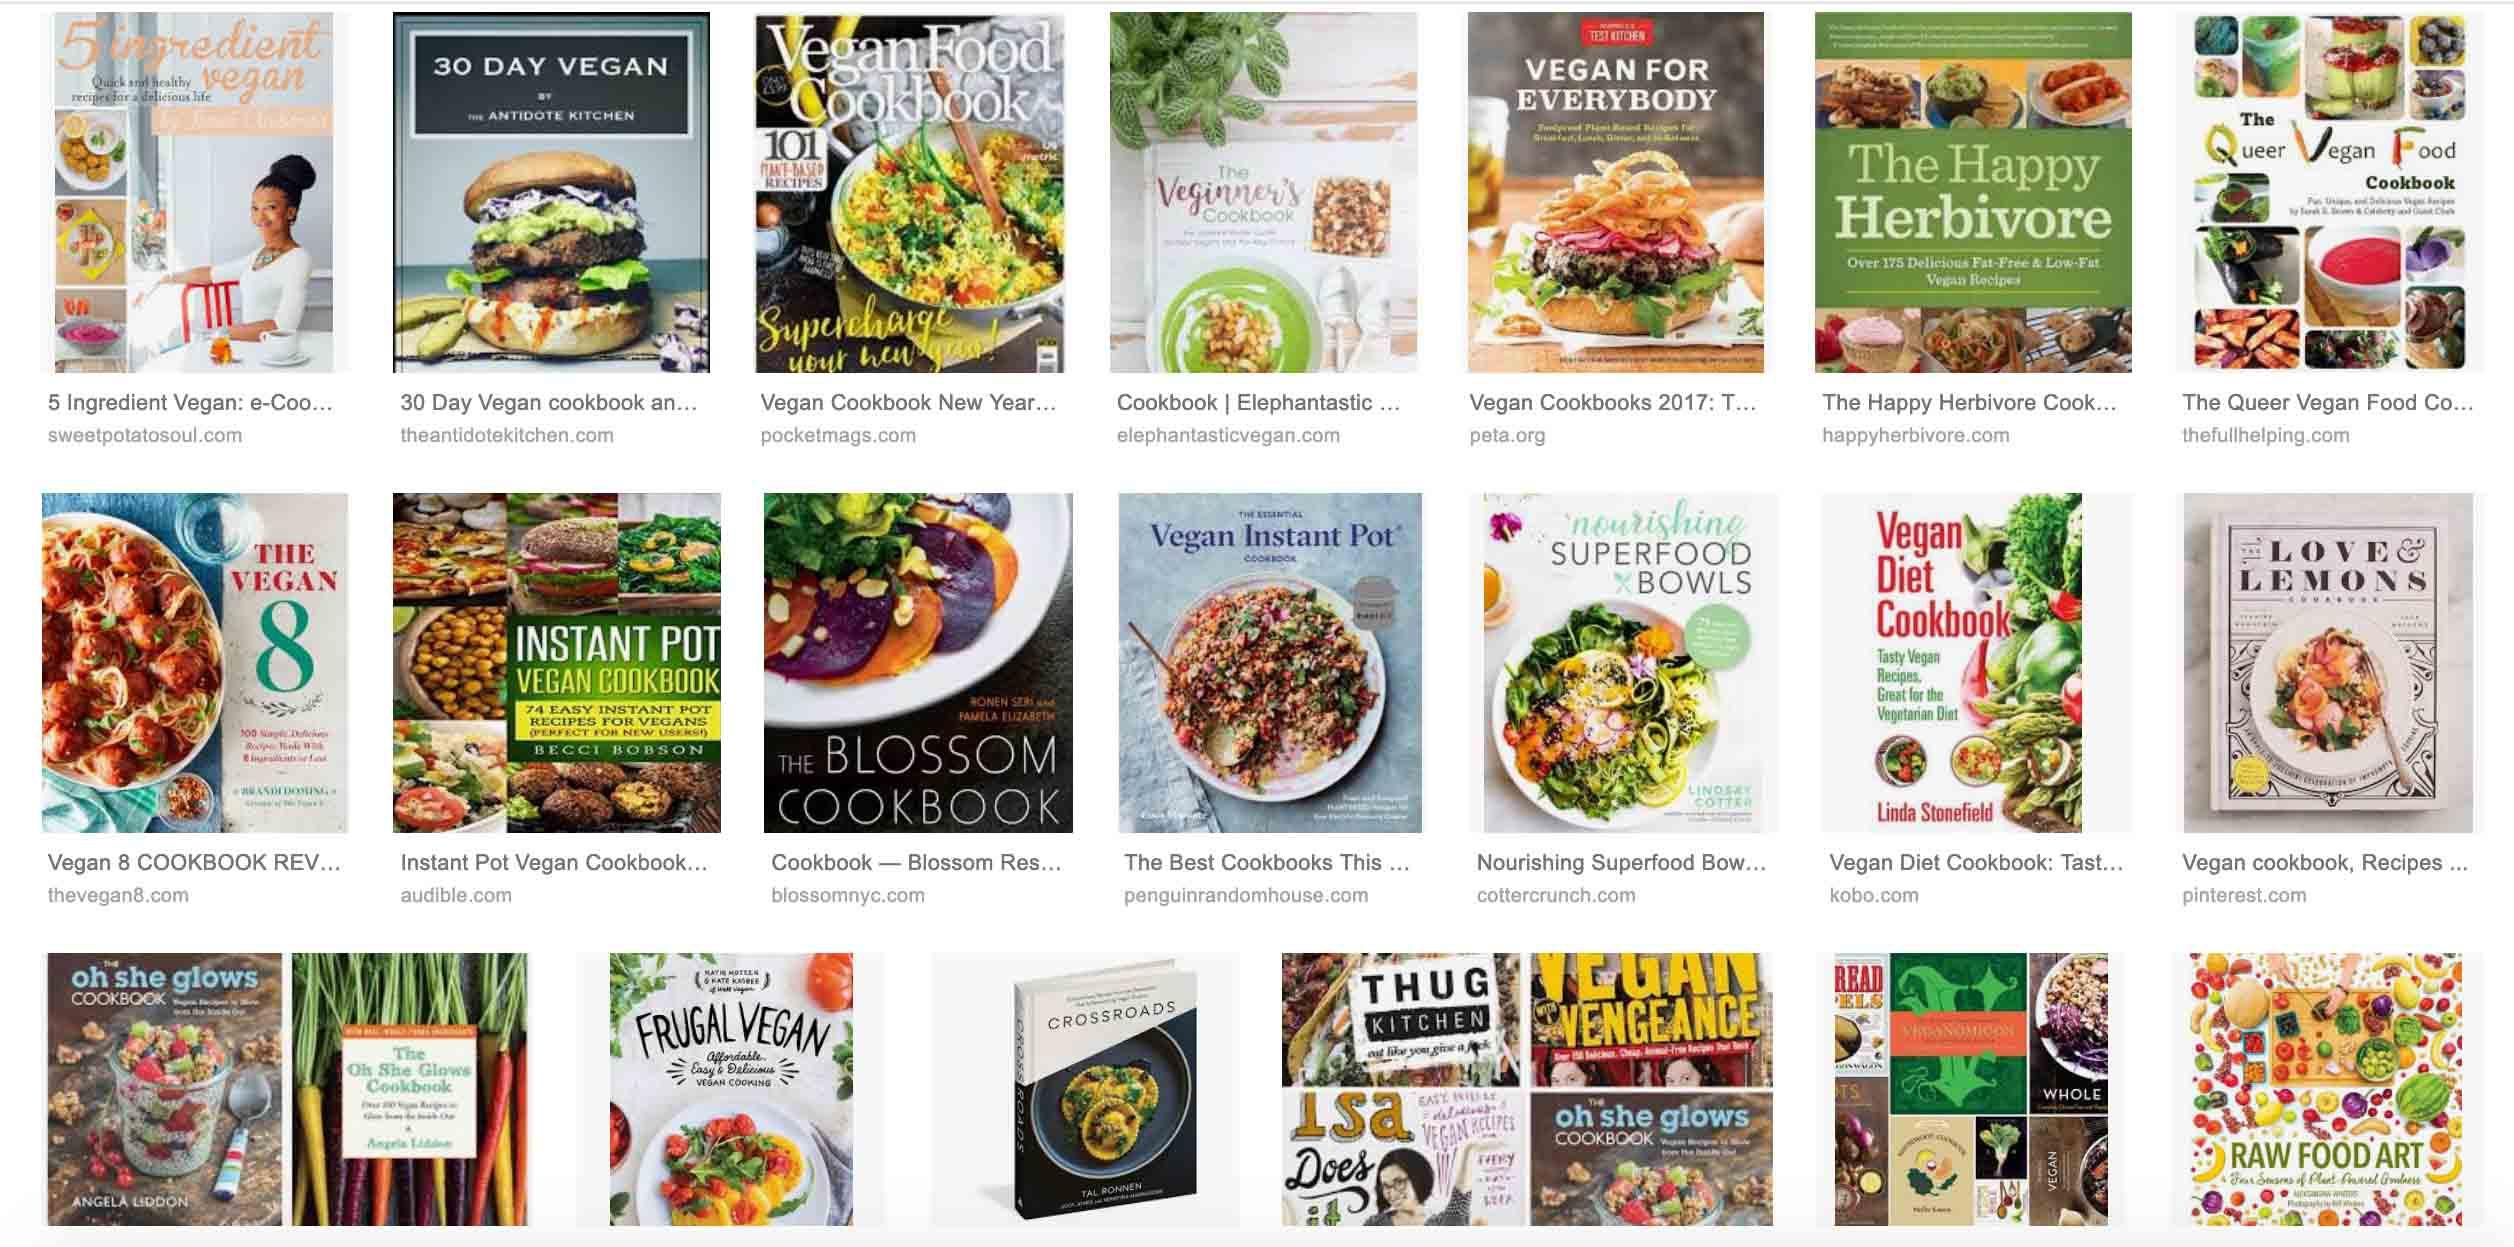 vegan food brands, vegan lifestyle photography, Vegan Food Advertising Trends, vegan food photography, vegan food influencers, vegan style recipes, vegan bloggers